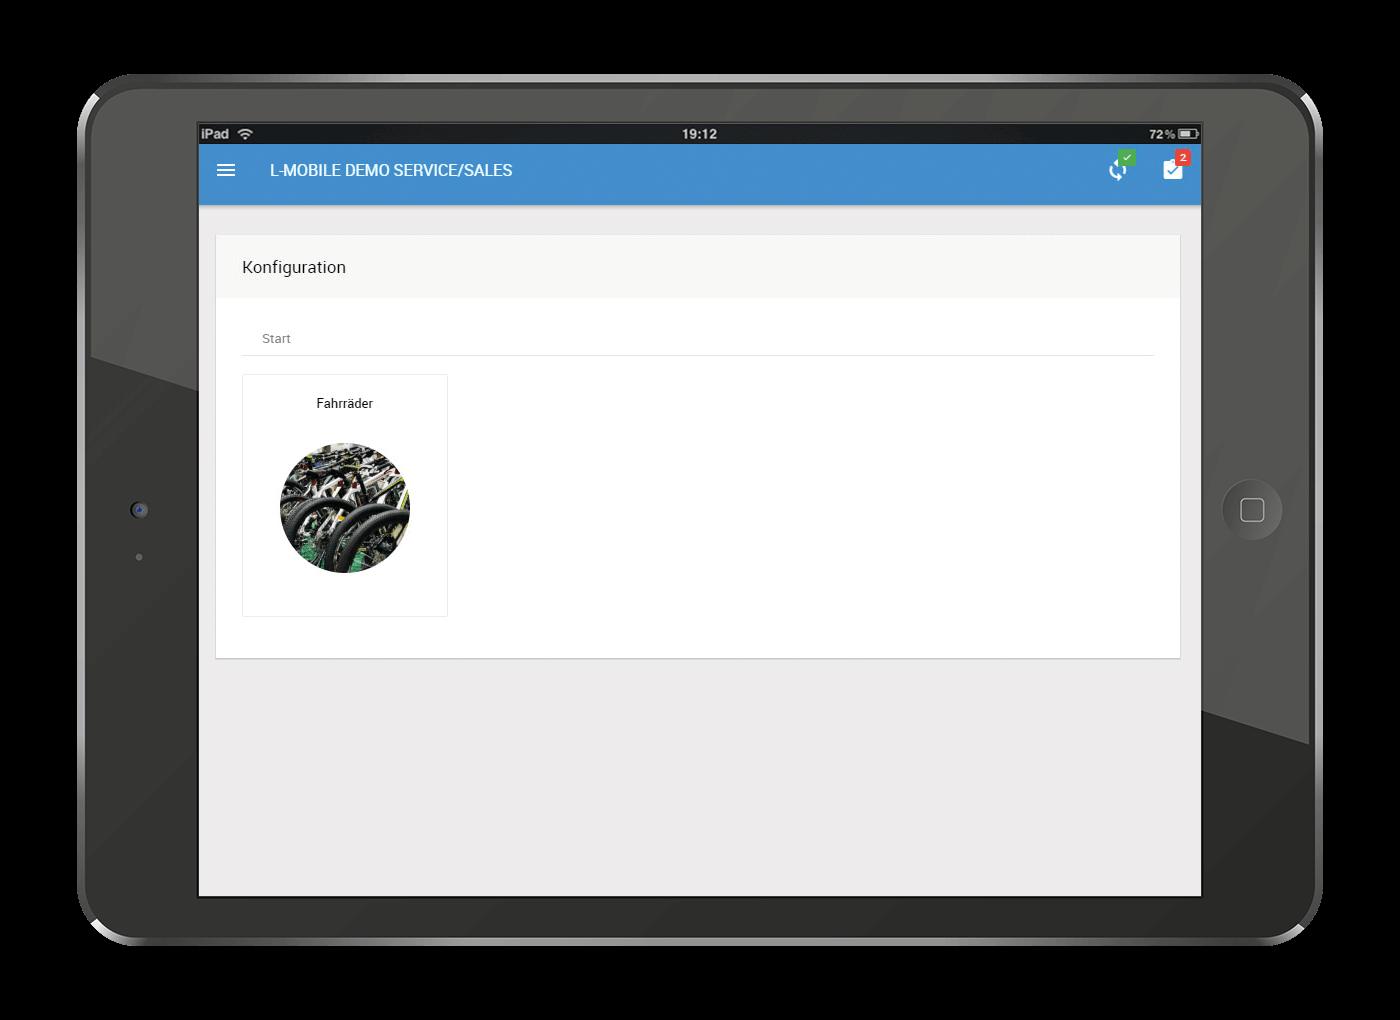 L-mobile Mobiler Vertrieb Konfigurator für Produkte